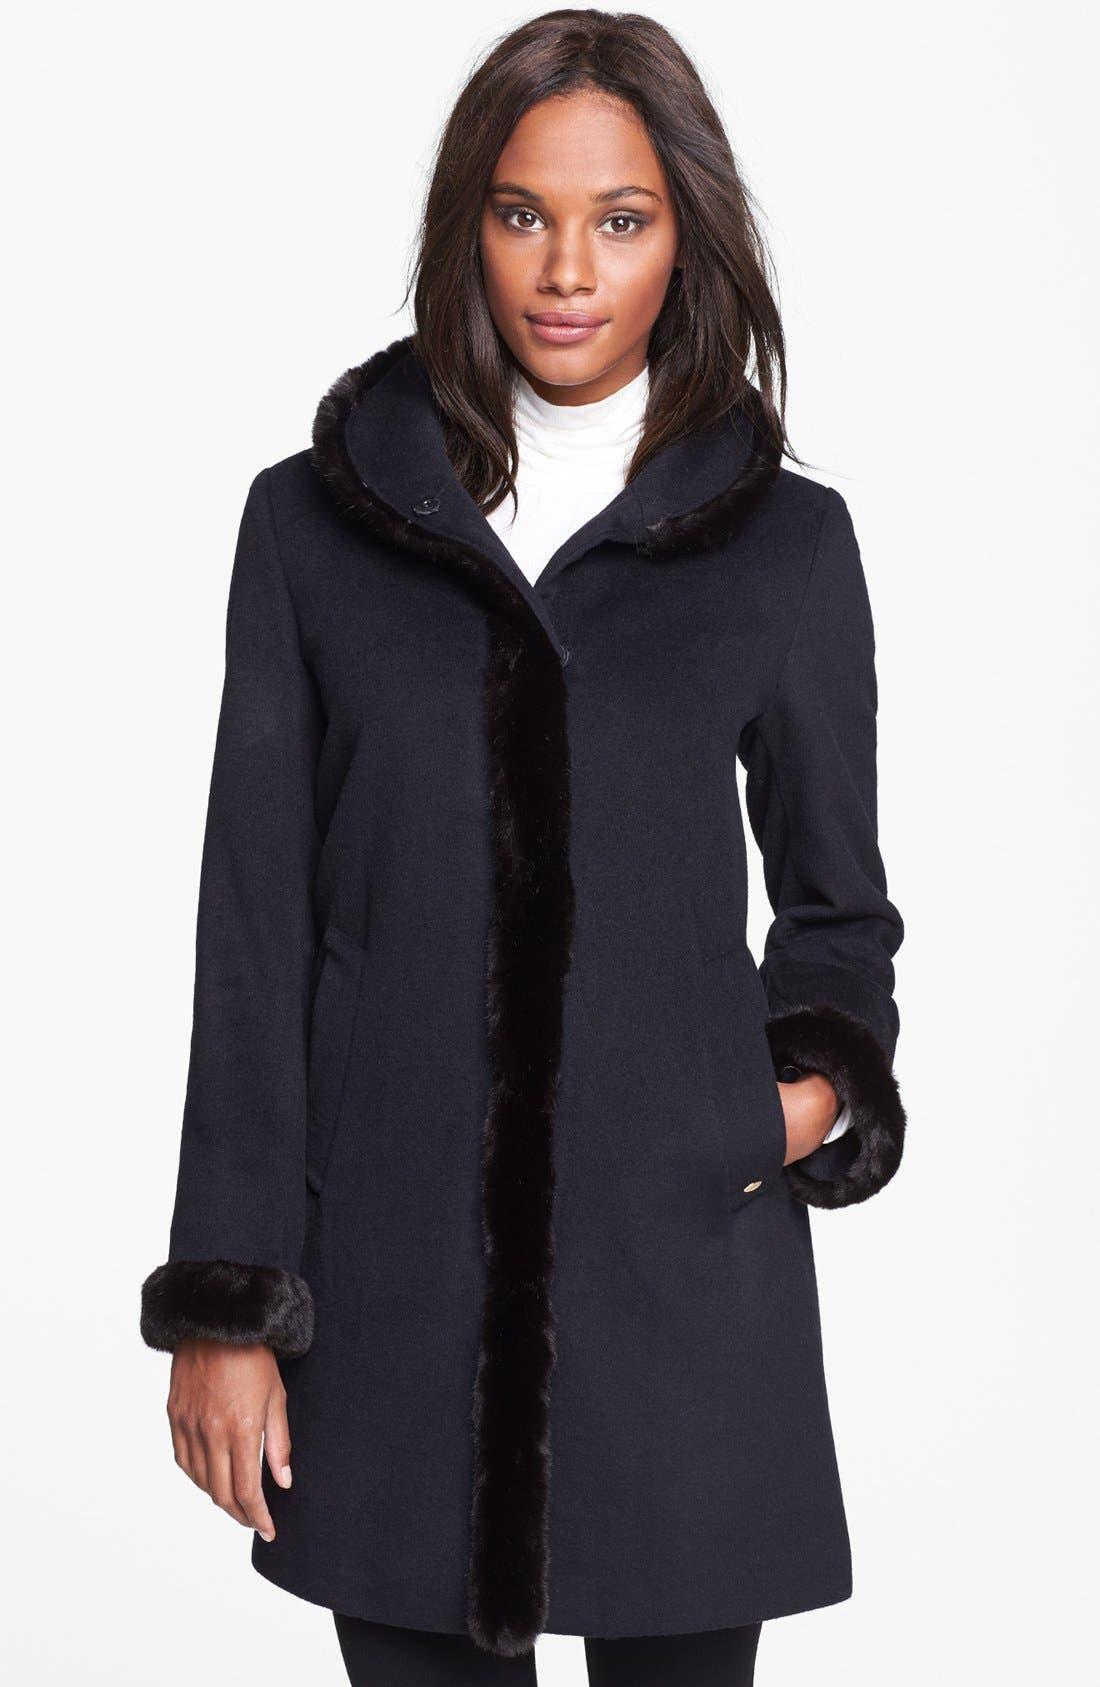 Alternate Image 1 Selected - Ellen Tracy Faux Fur Trim Wool Blend Coat (Nordstrom Exclusive)